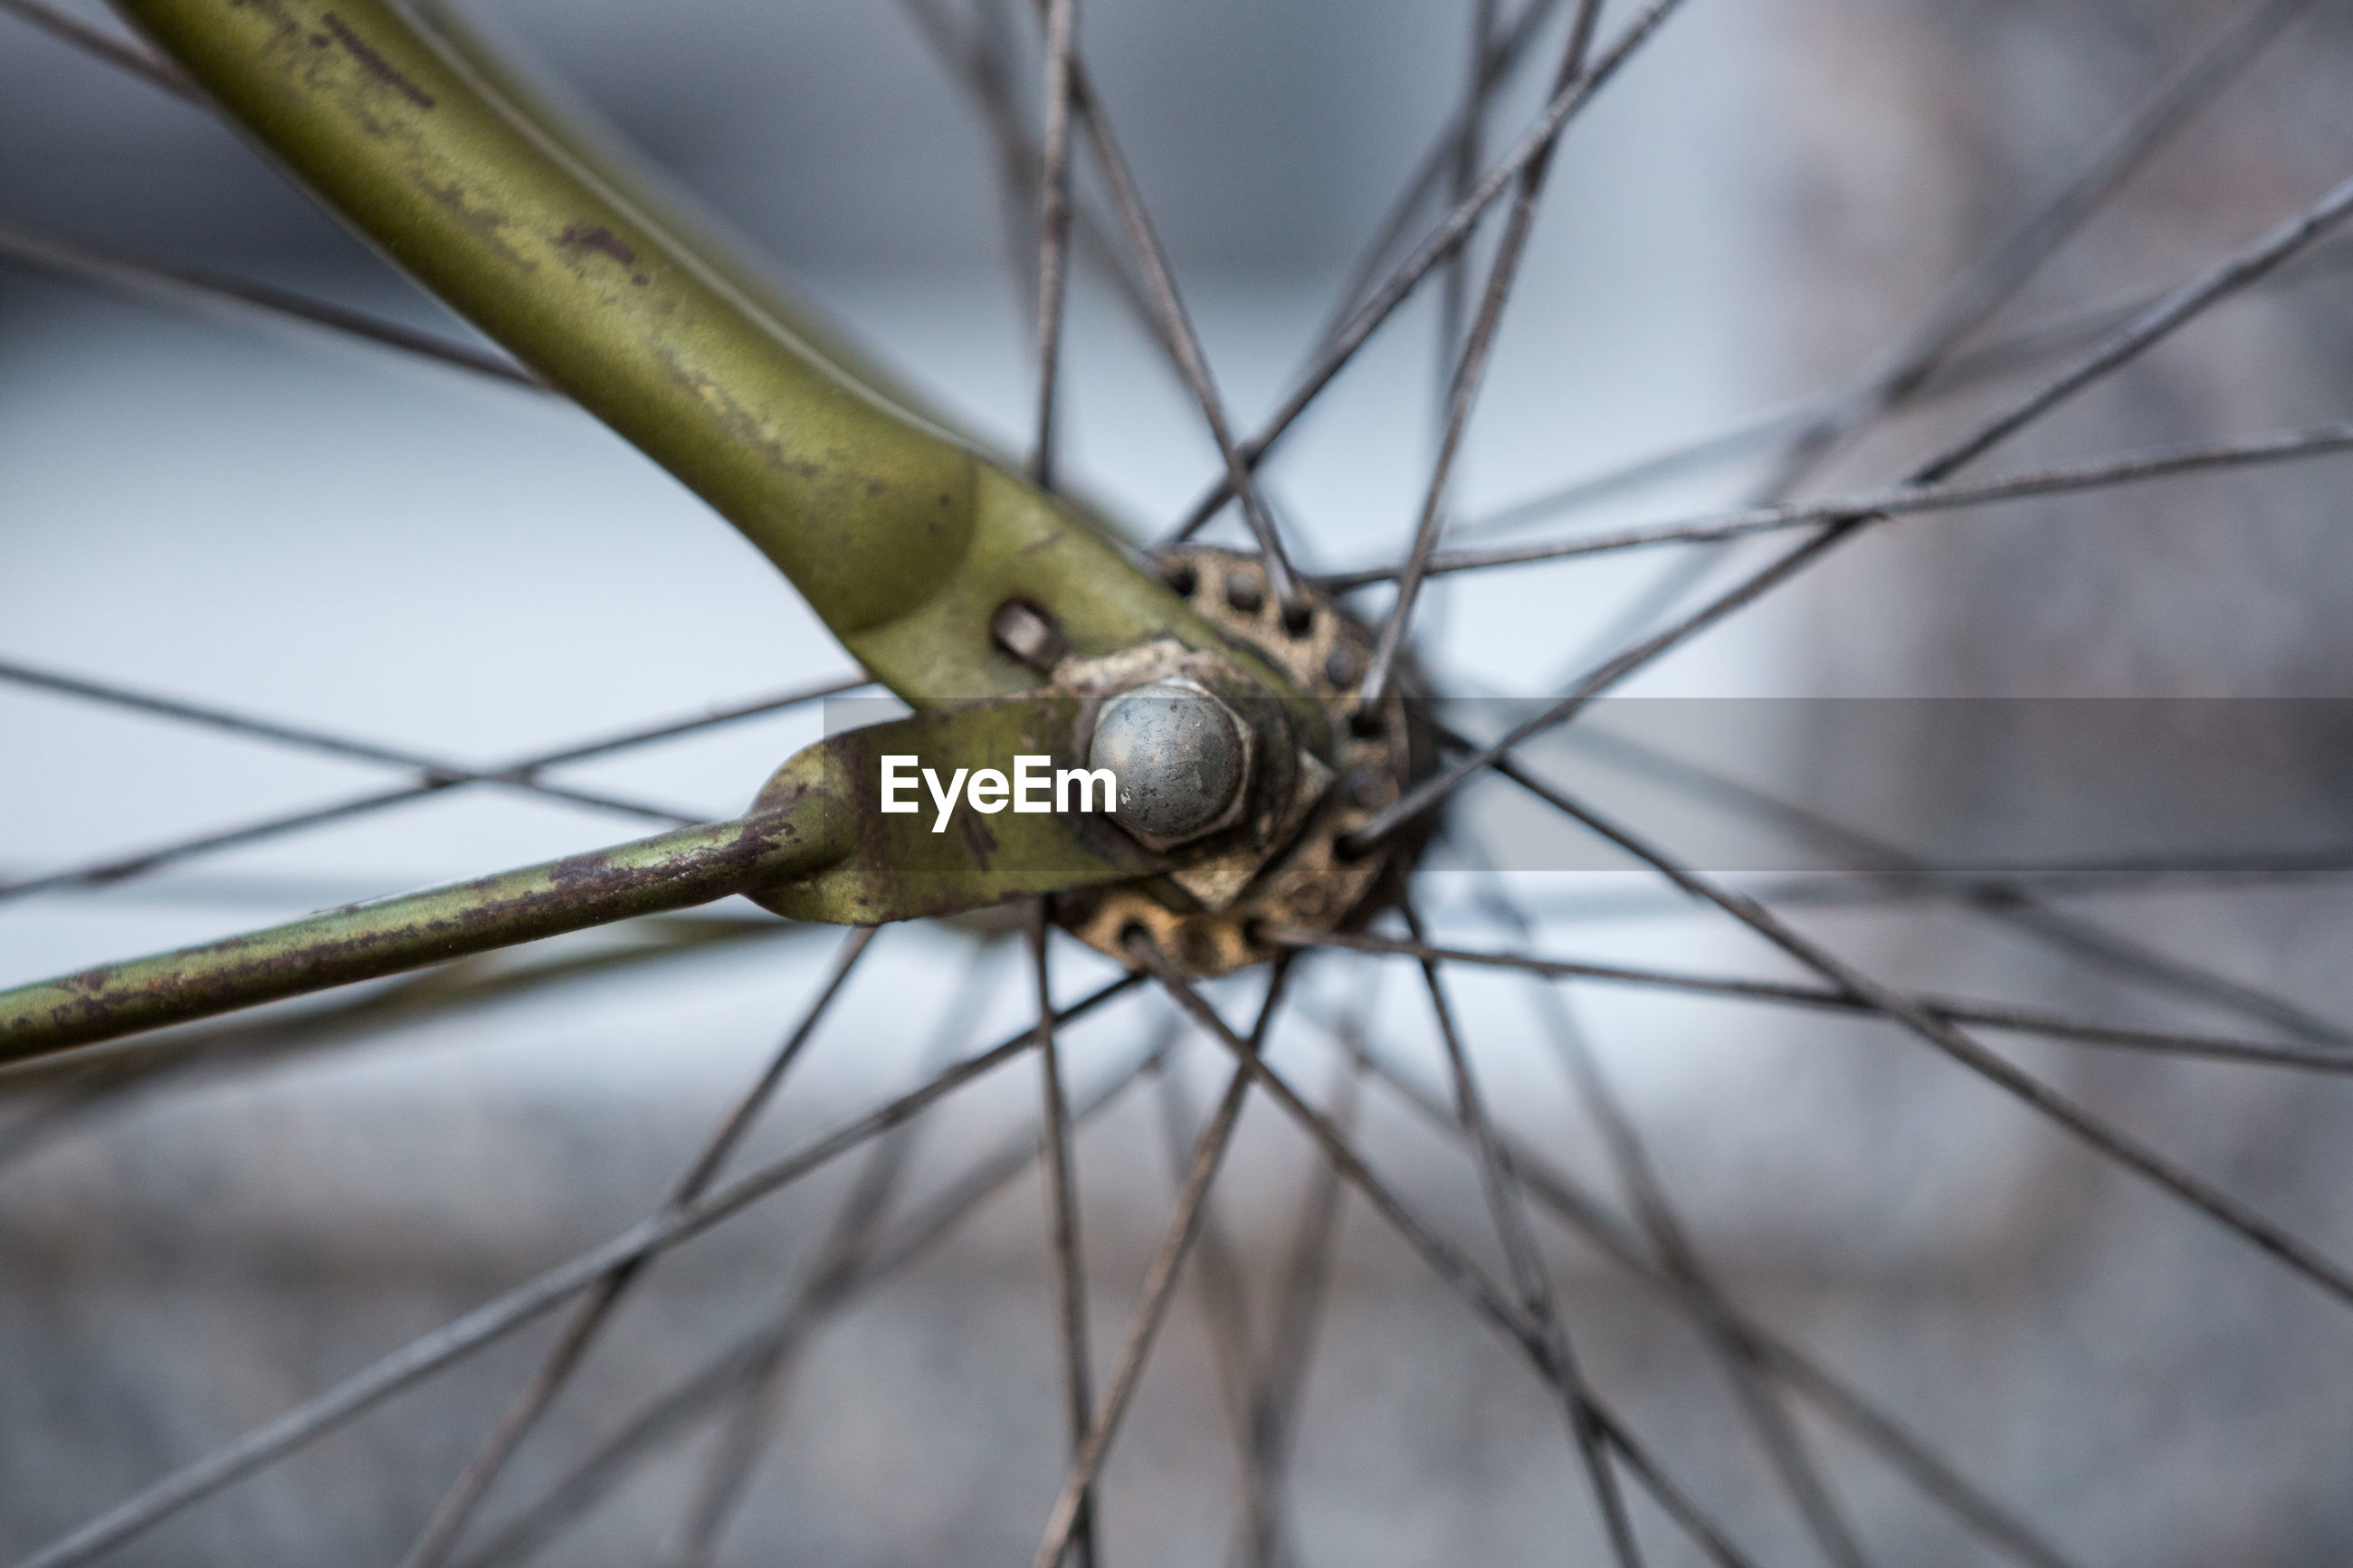 Cropped image of bicycle spoke wheel